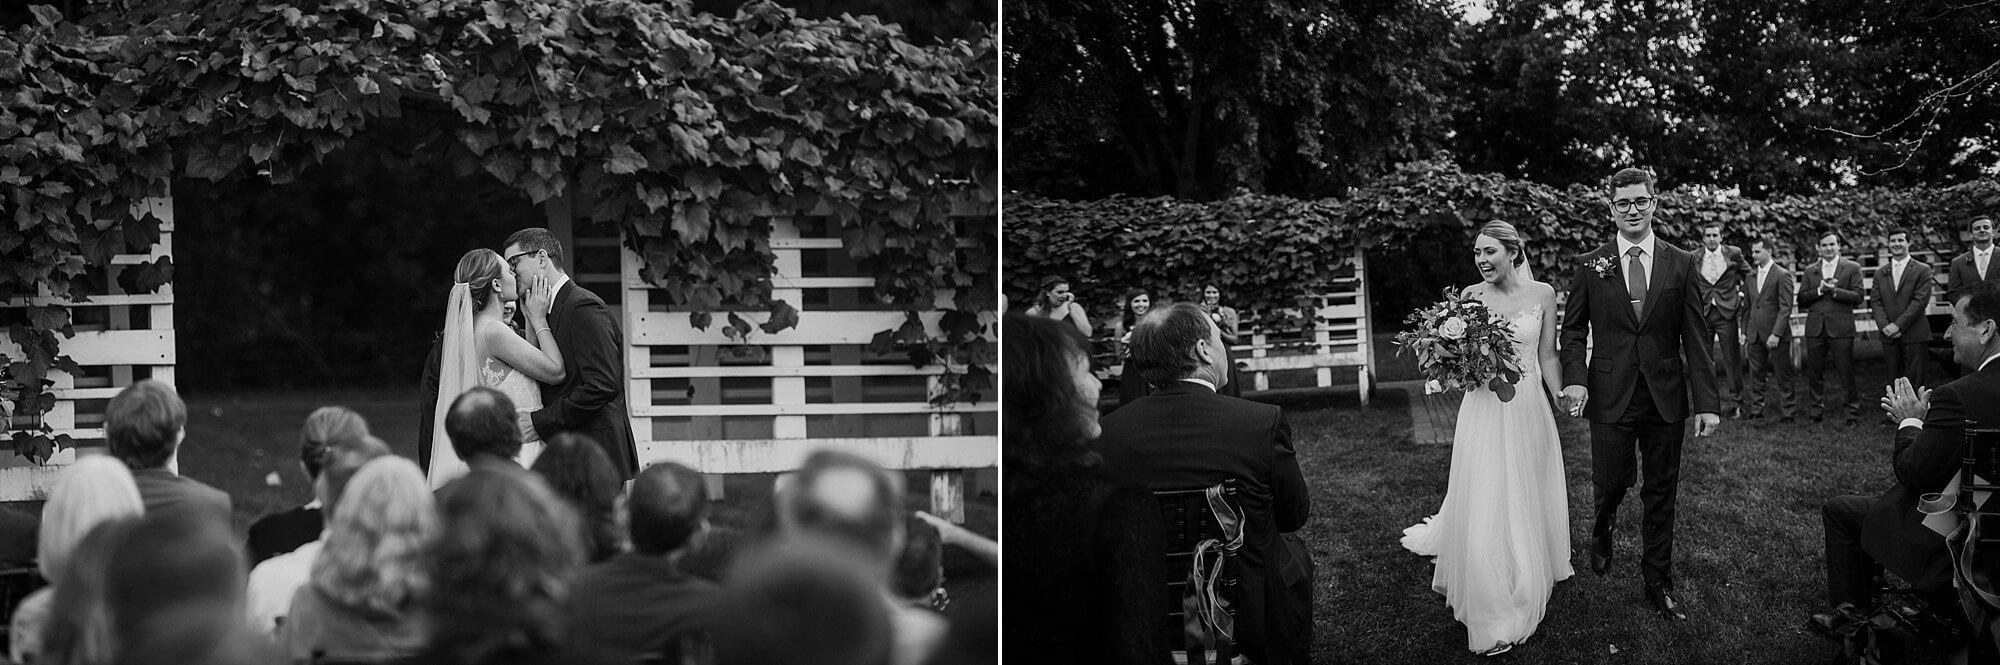 Commanders Mansion Wedding - Ebersole Photo_0020.jpg